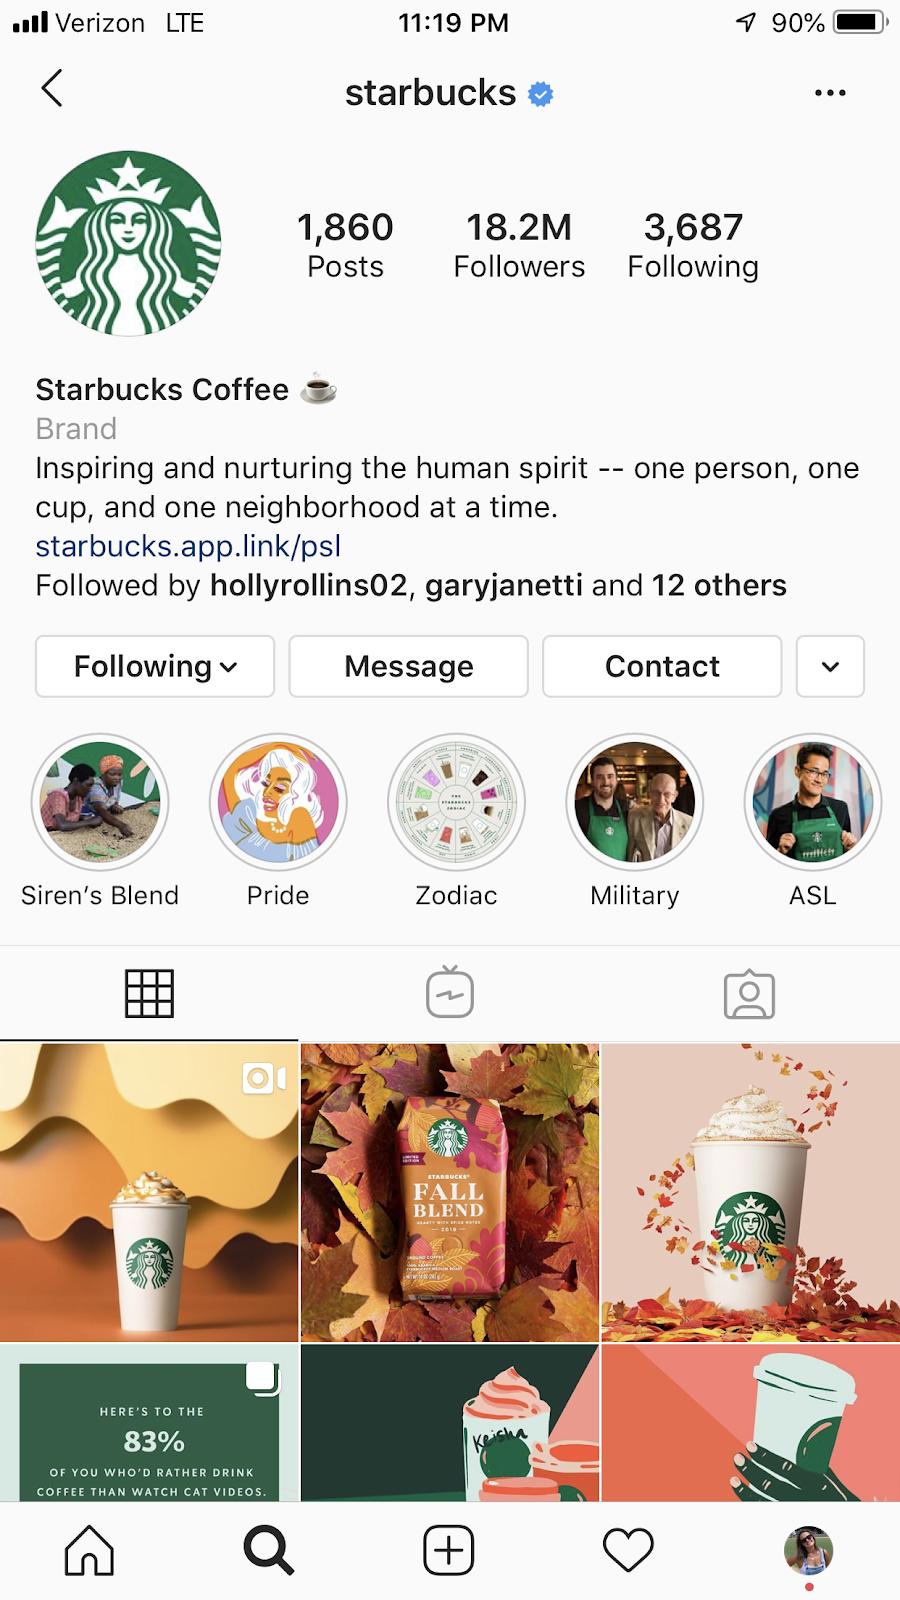 starbucks instagram profile